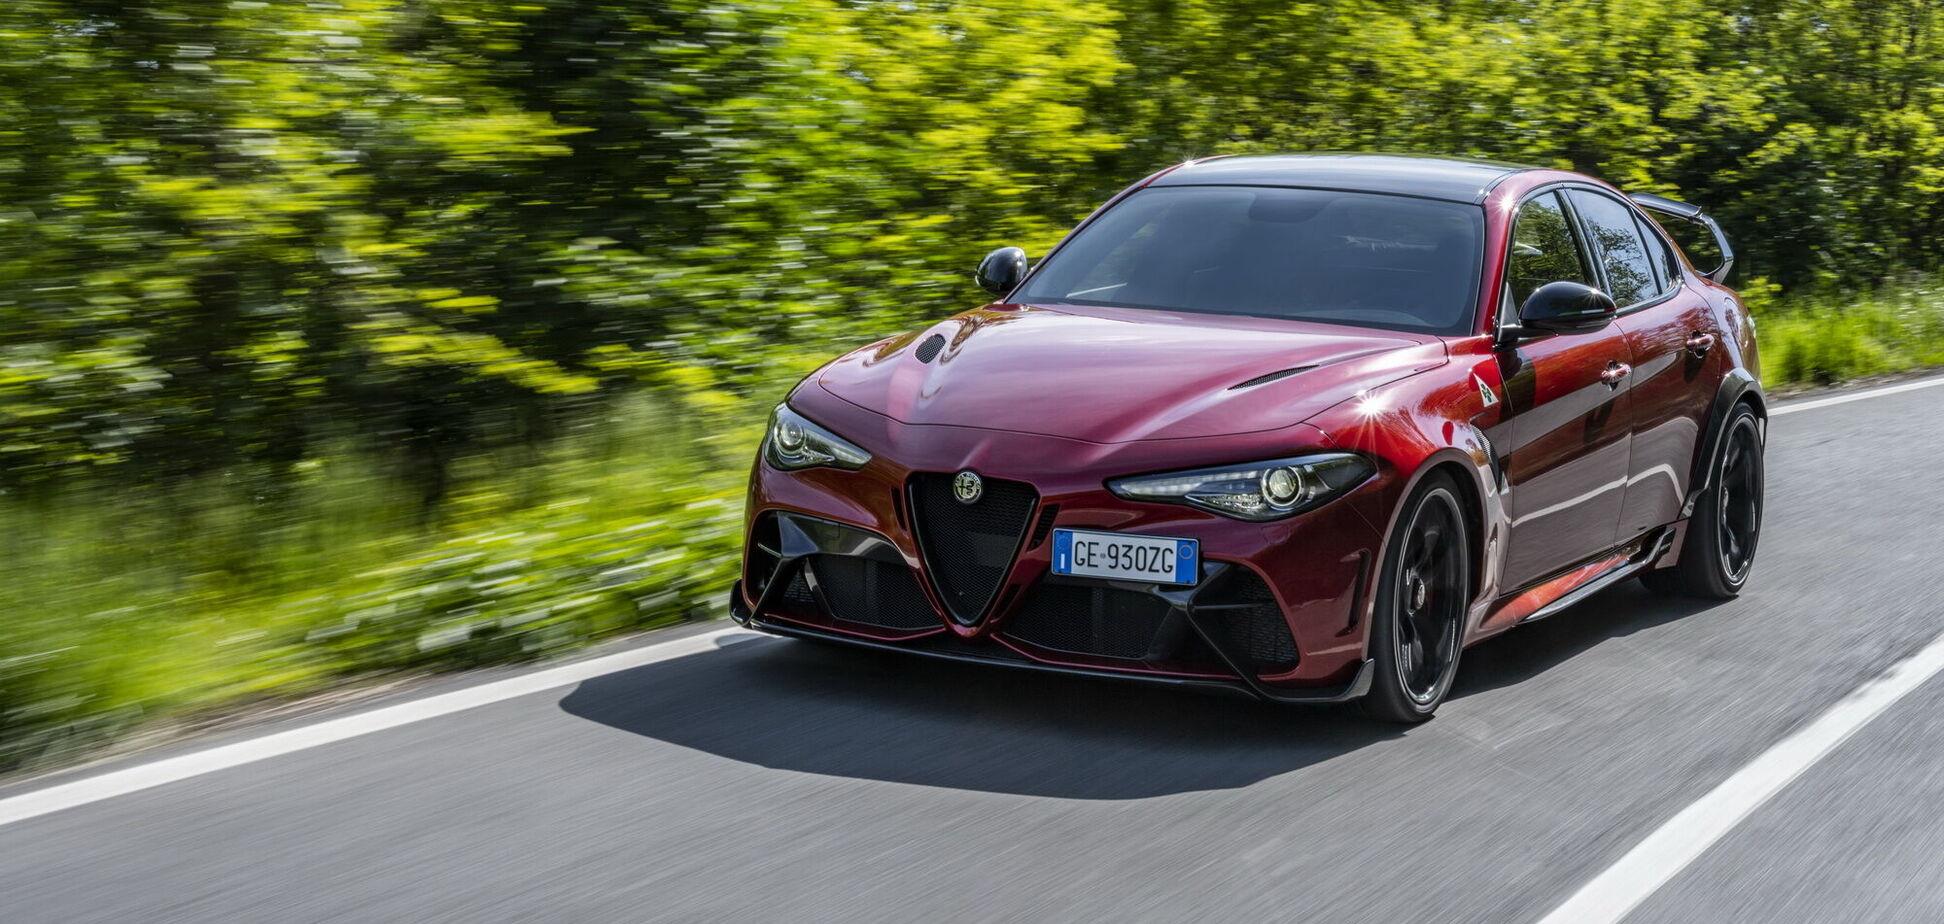 Alfa Romeo презентувала нові спортседани Giulia GTA та GTAm